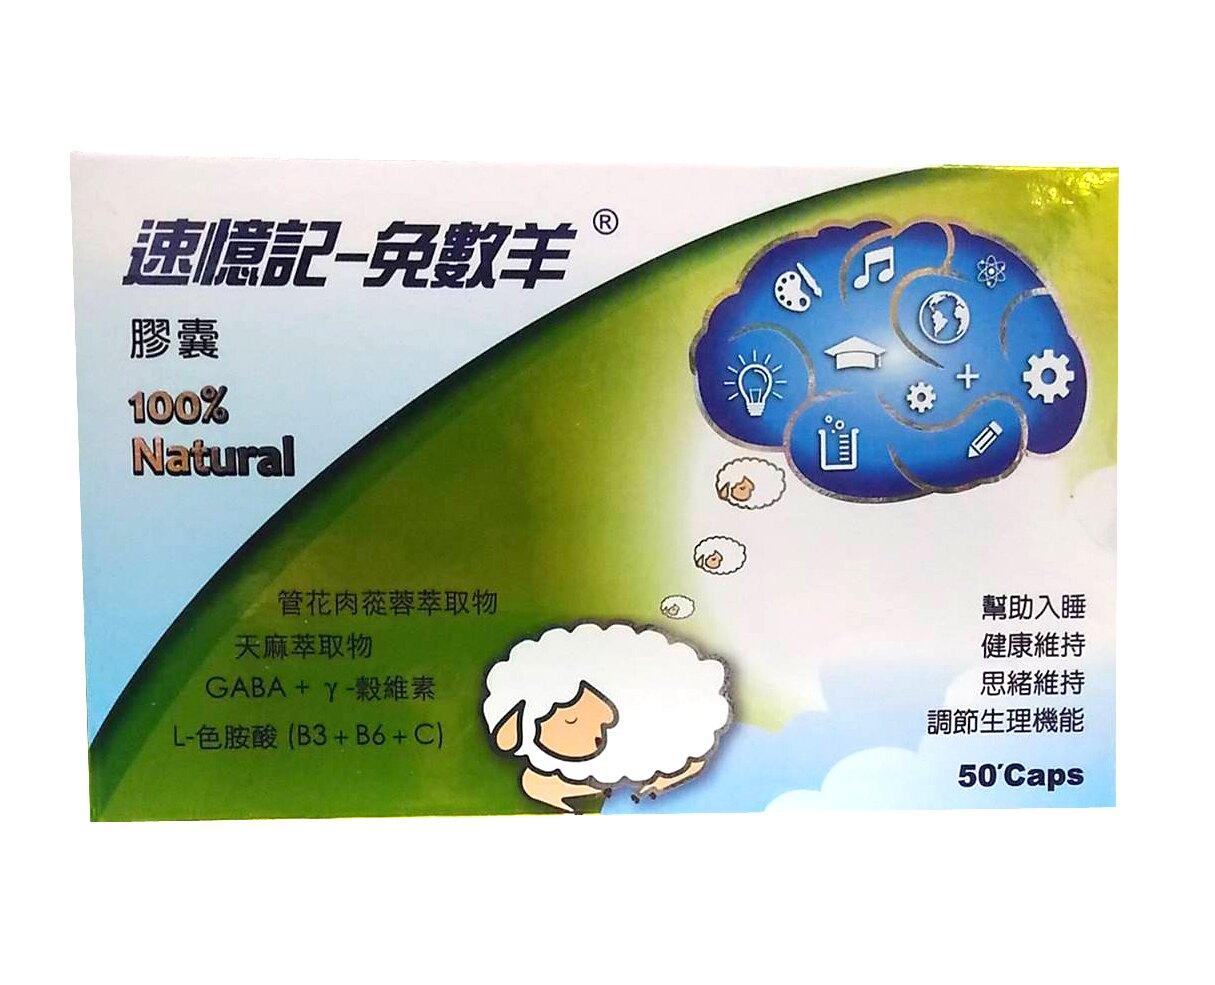 HUA 速憶記-免數羊配方膠囊50顆裝【德芳保健藥妝】色胺酸 GABA 天麻